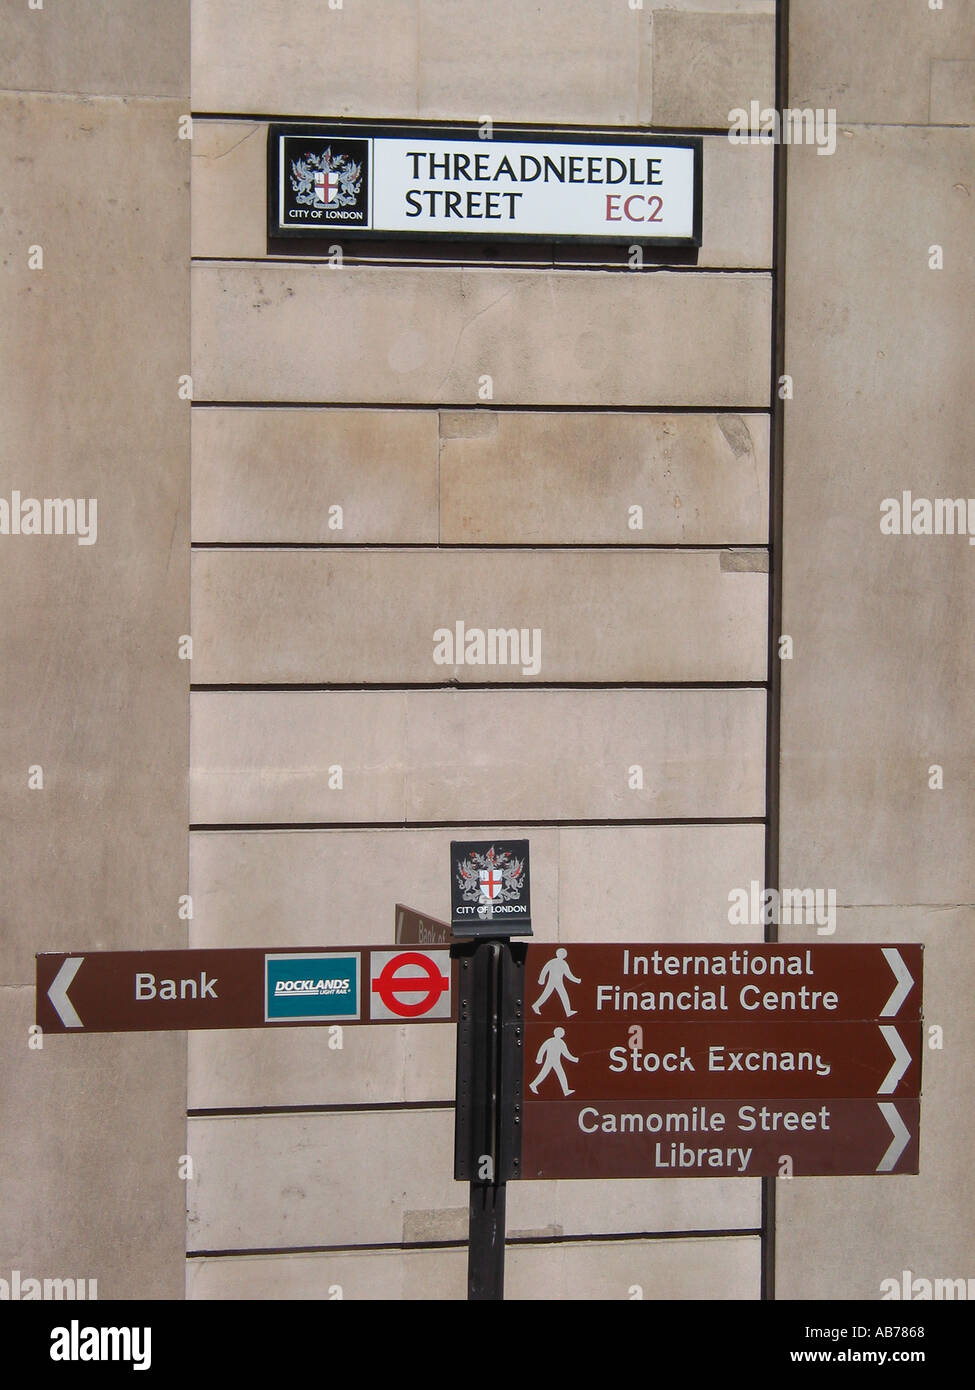 Banking Area Street Sign Bank of England Threadneedle Street EC2 City of London Street Sign London GB - Stock Image